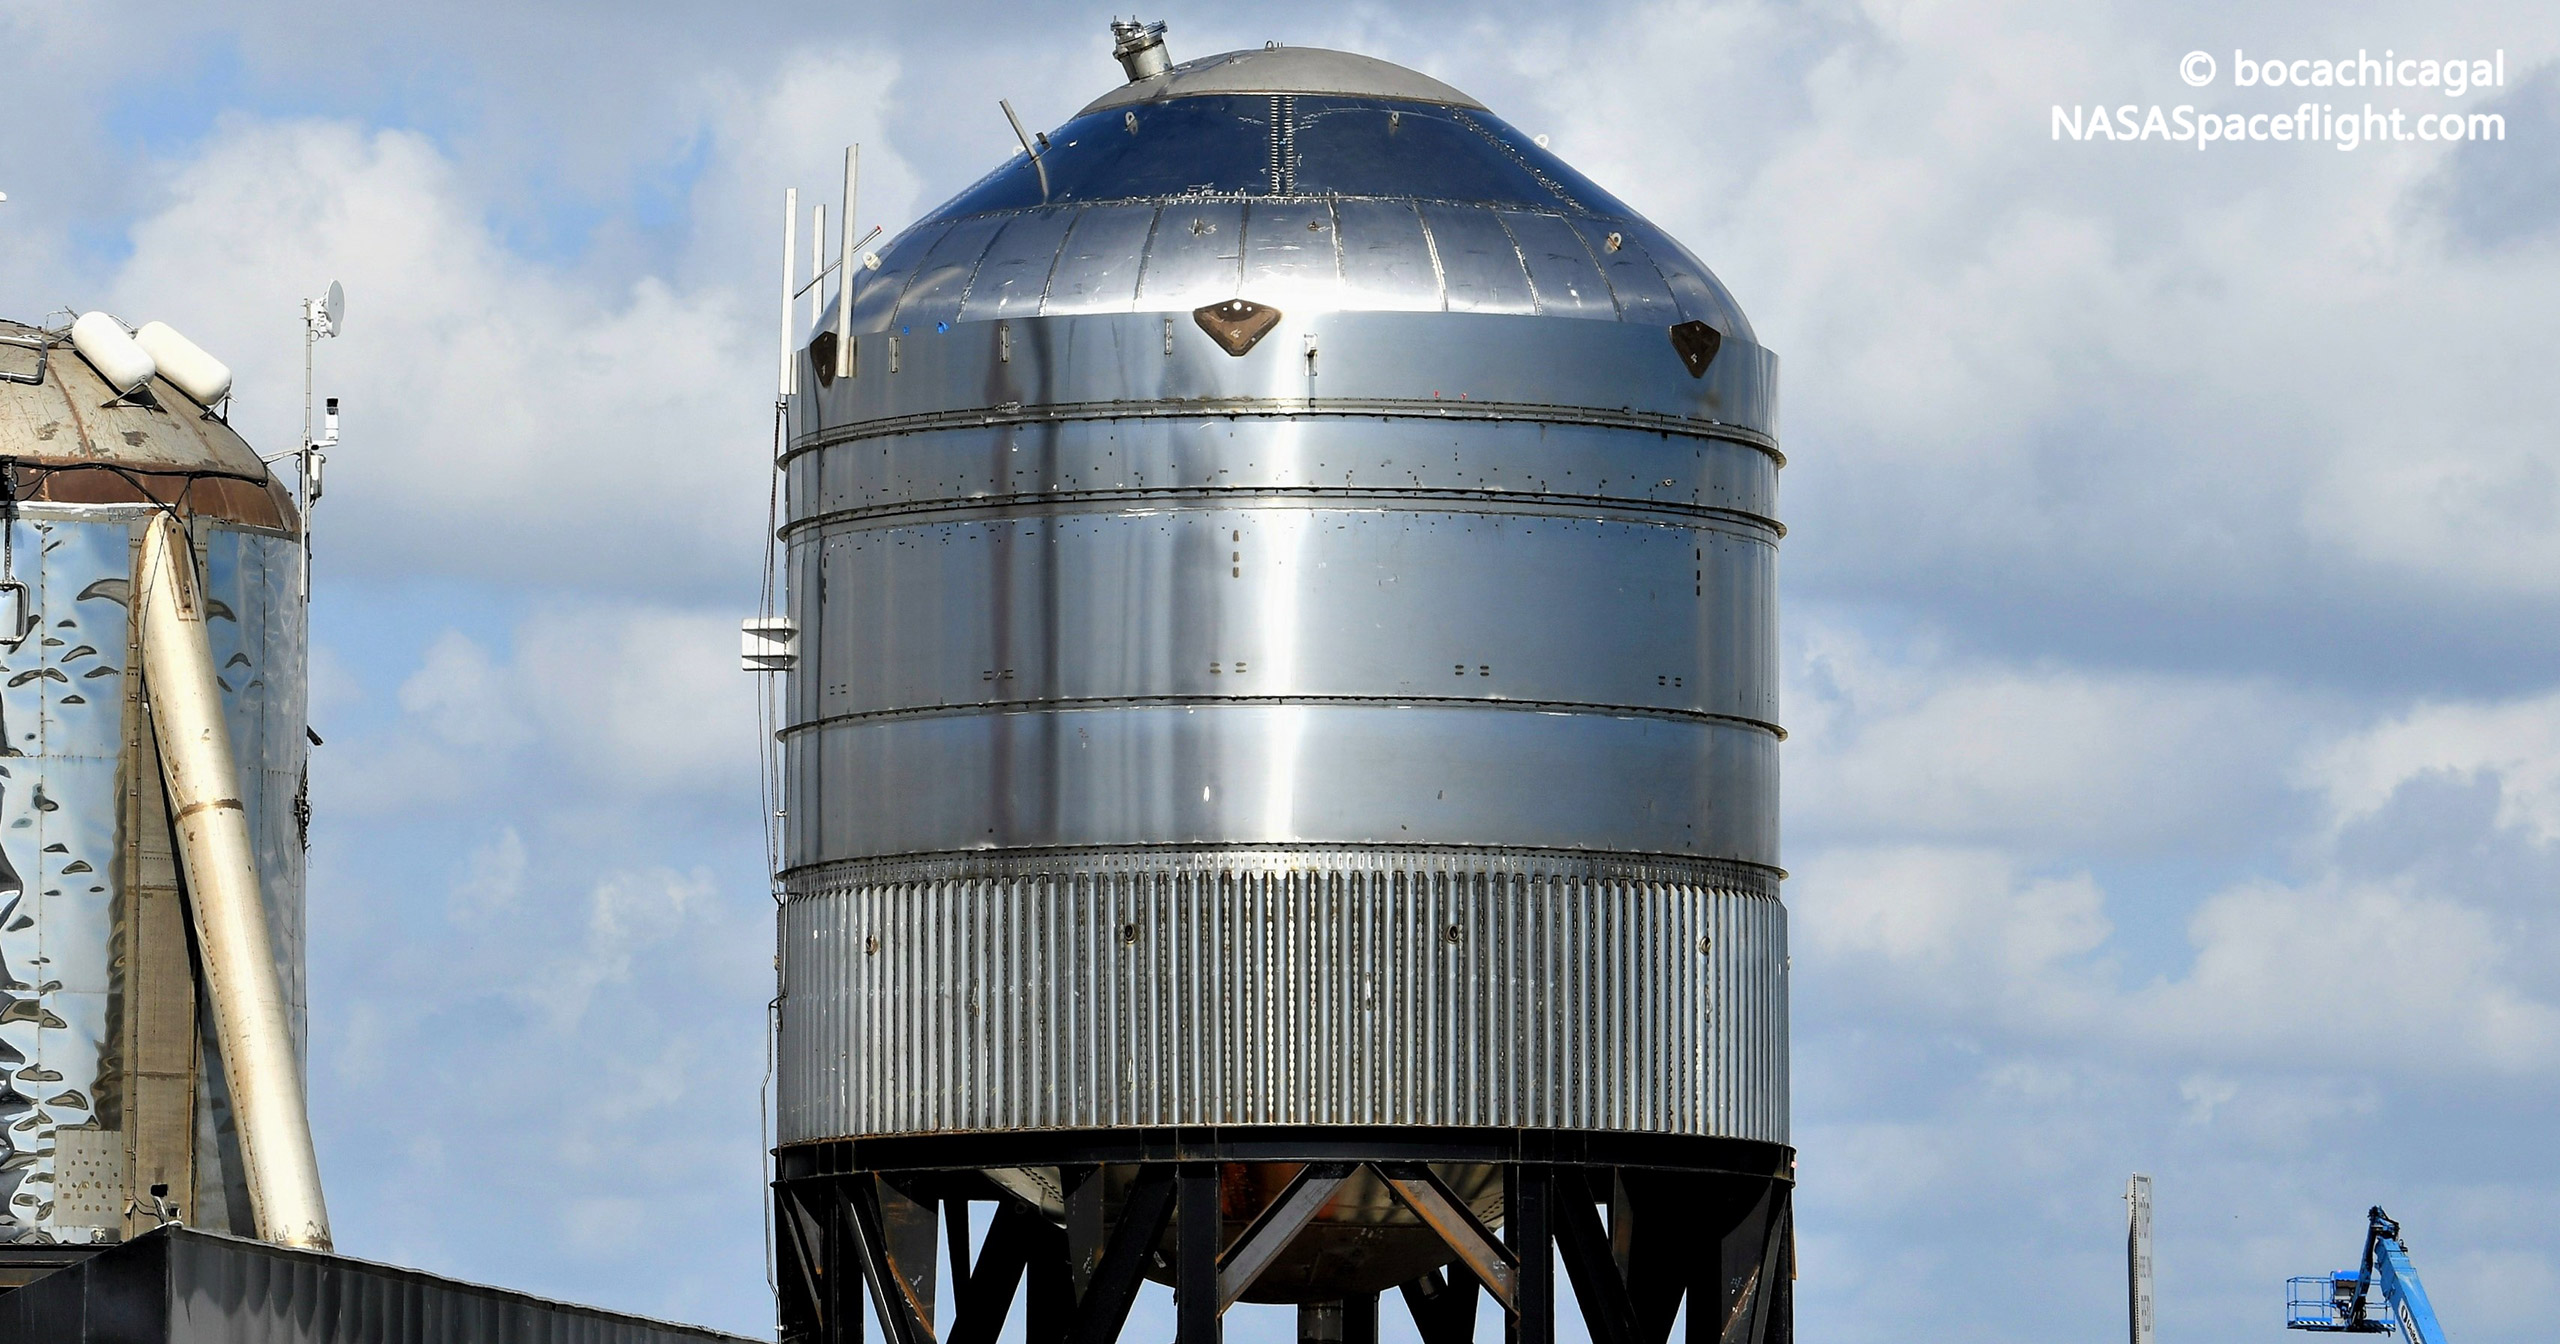 Starship Boca Chica 082321 (NASASpaceflight – bocachicagal) GSE4 test tank 2 crop 2 (c)